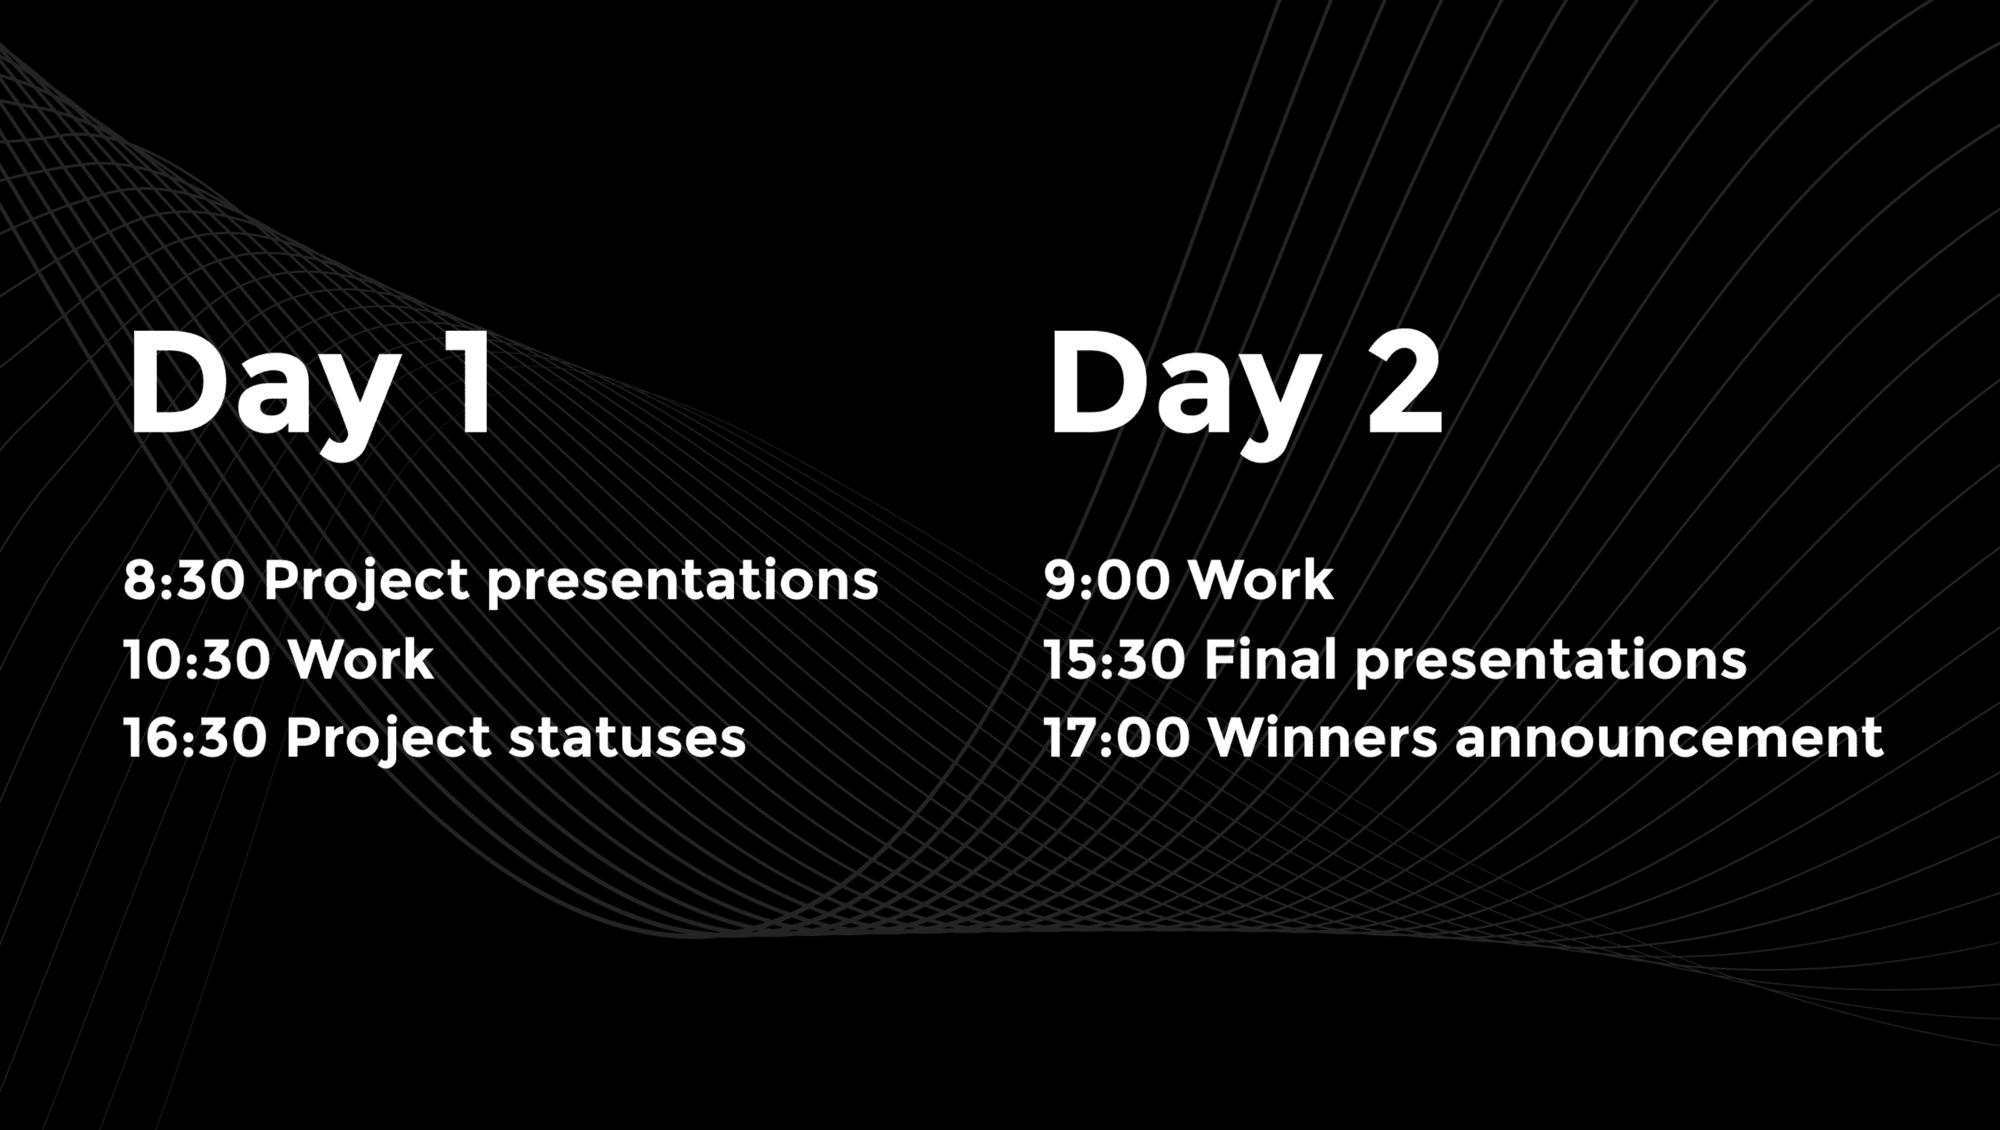 2021 Hackathon schedule